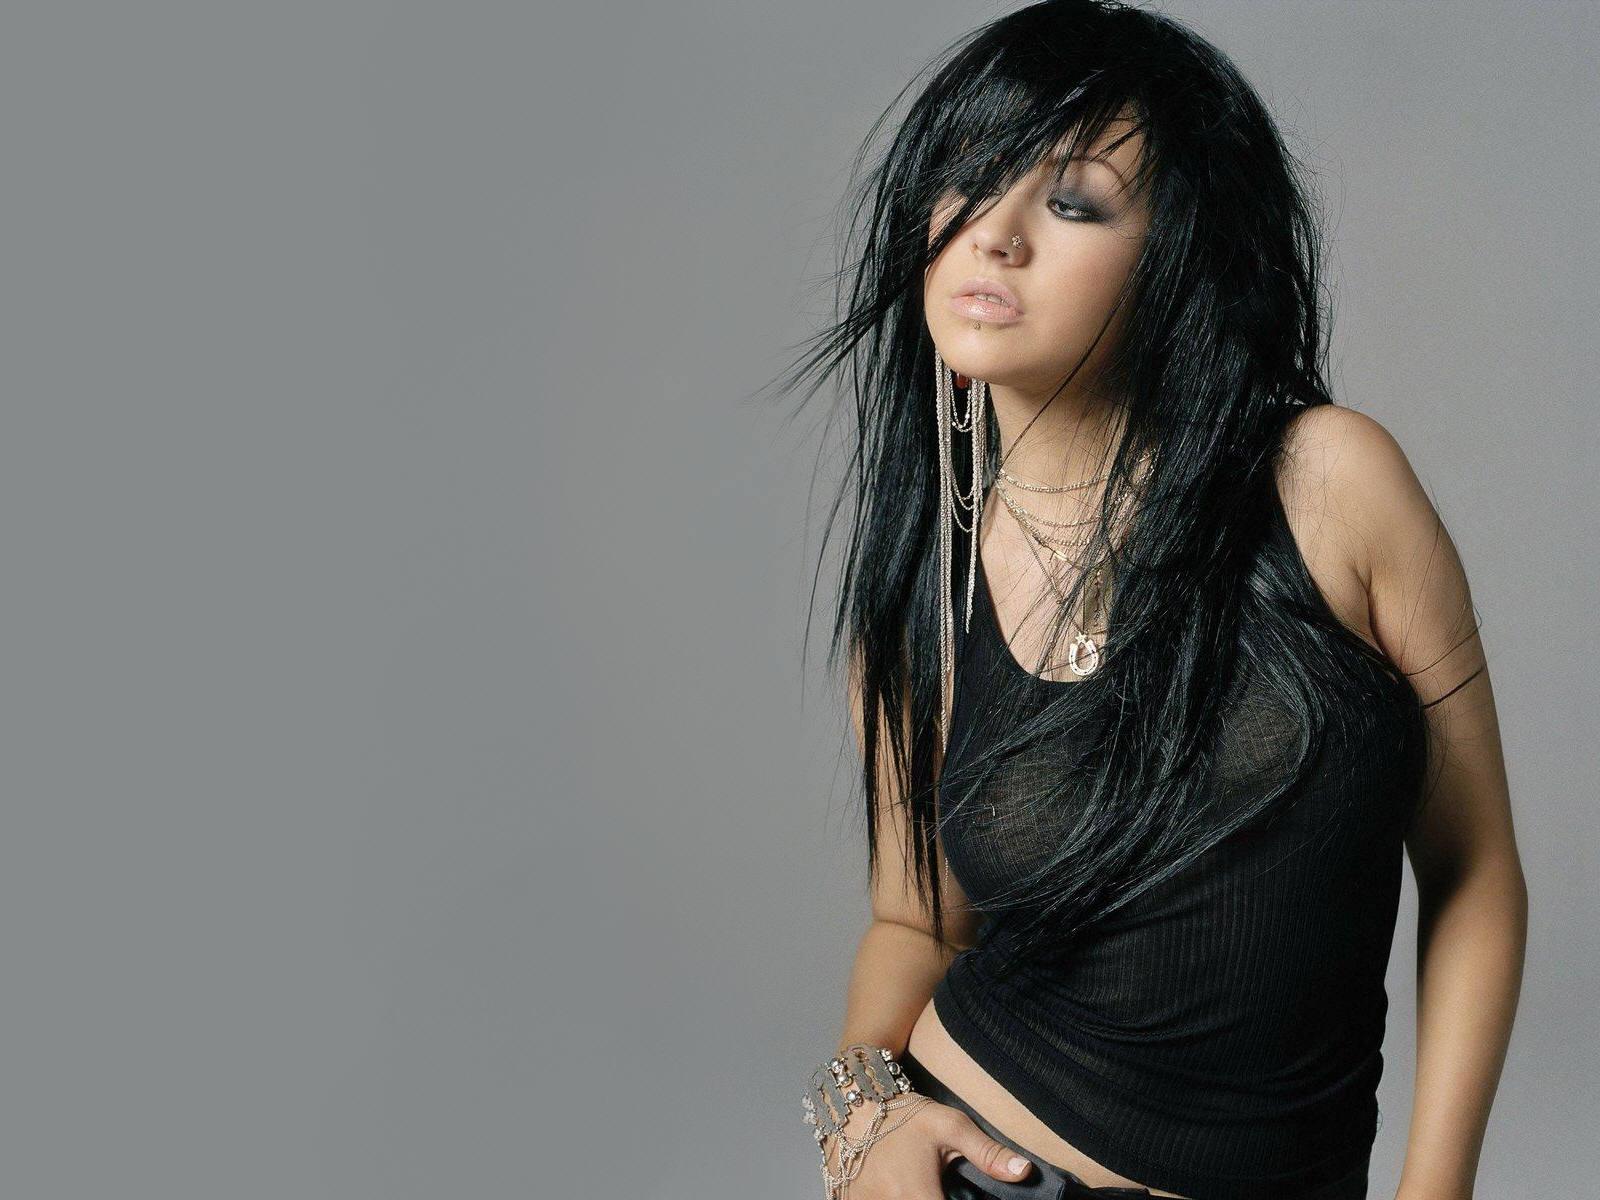 New Christina Aguilera Hot desktop HD wallpapers 2012 1600x1200